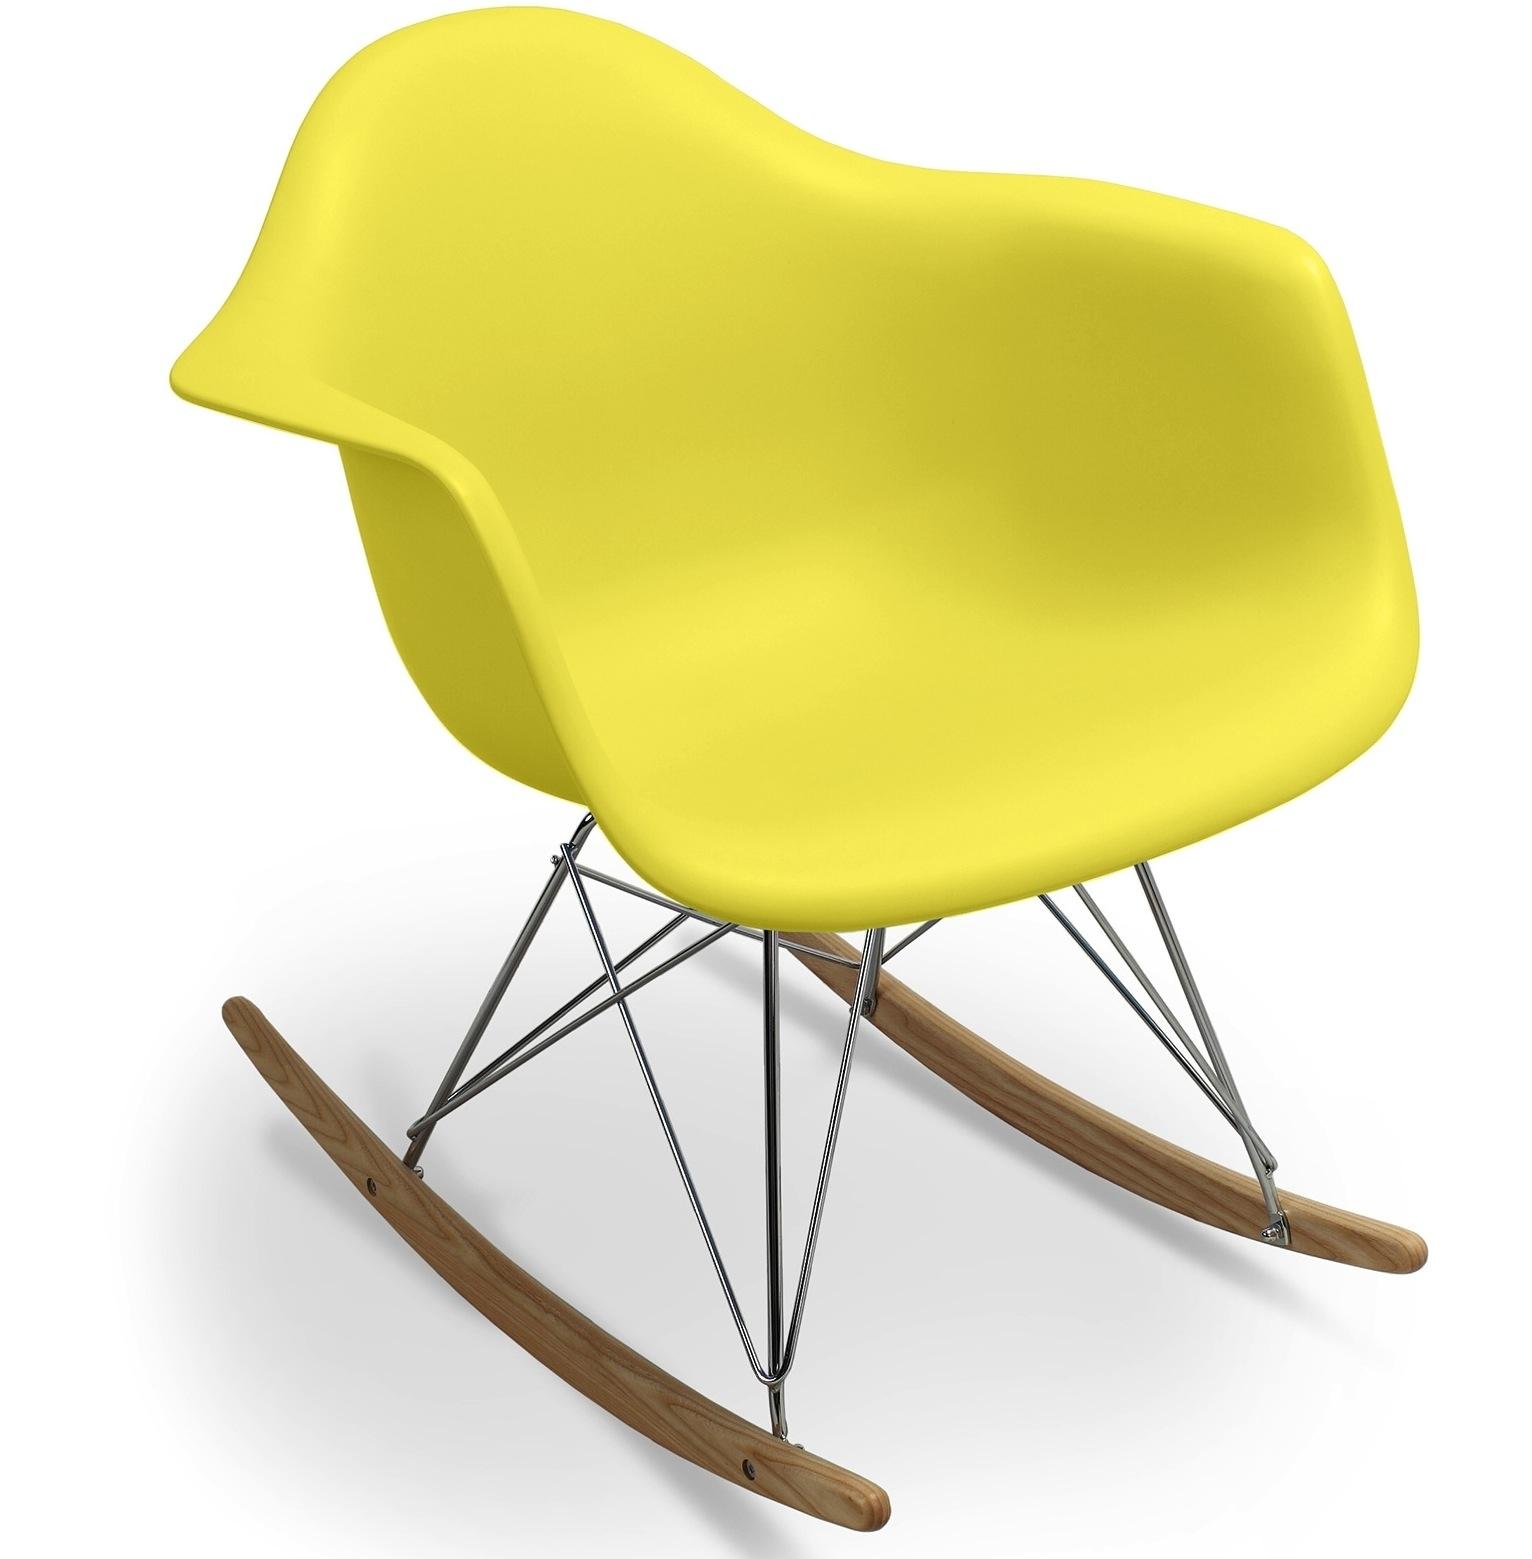 fauteuil bascule jaune mat inspir e charles eames. Black Bedroom Furniture Sets. Home Design Ideas